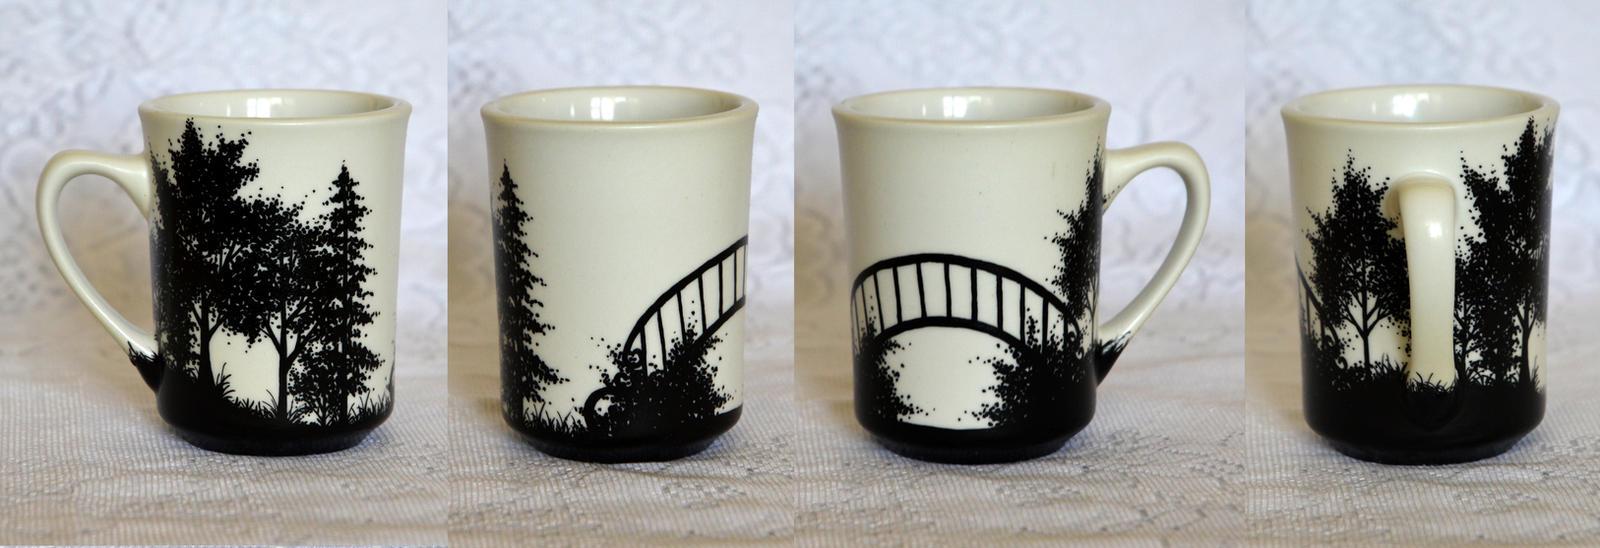 Forest Scene Mug by AucoinArt